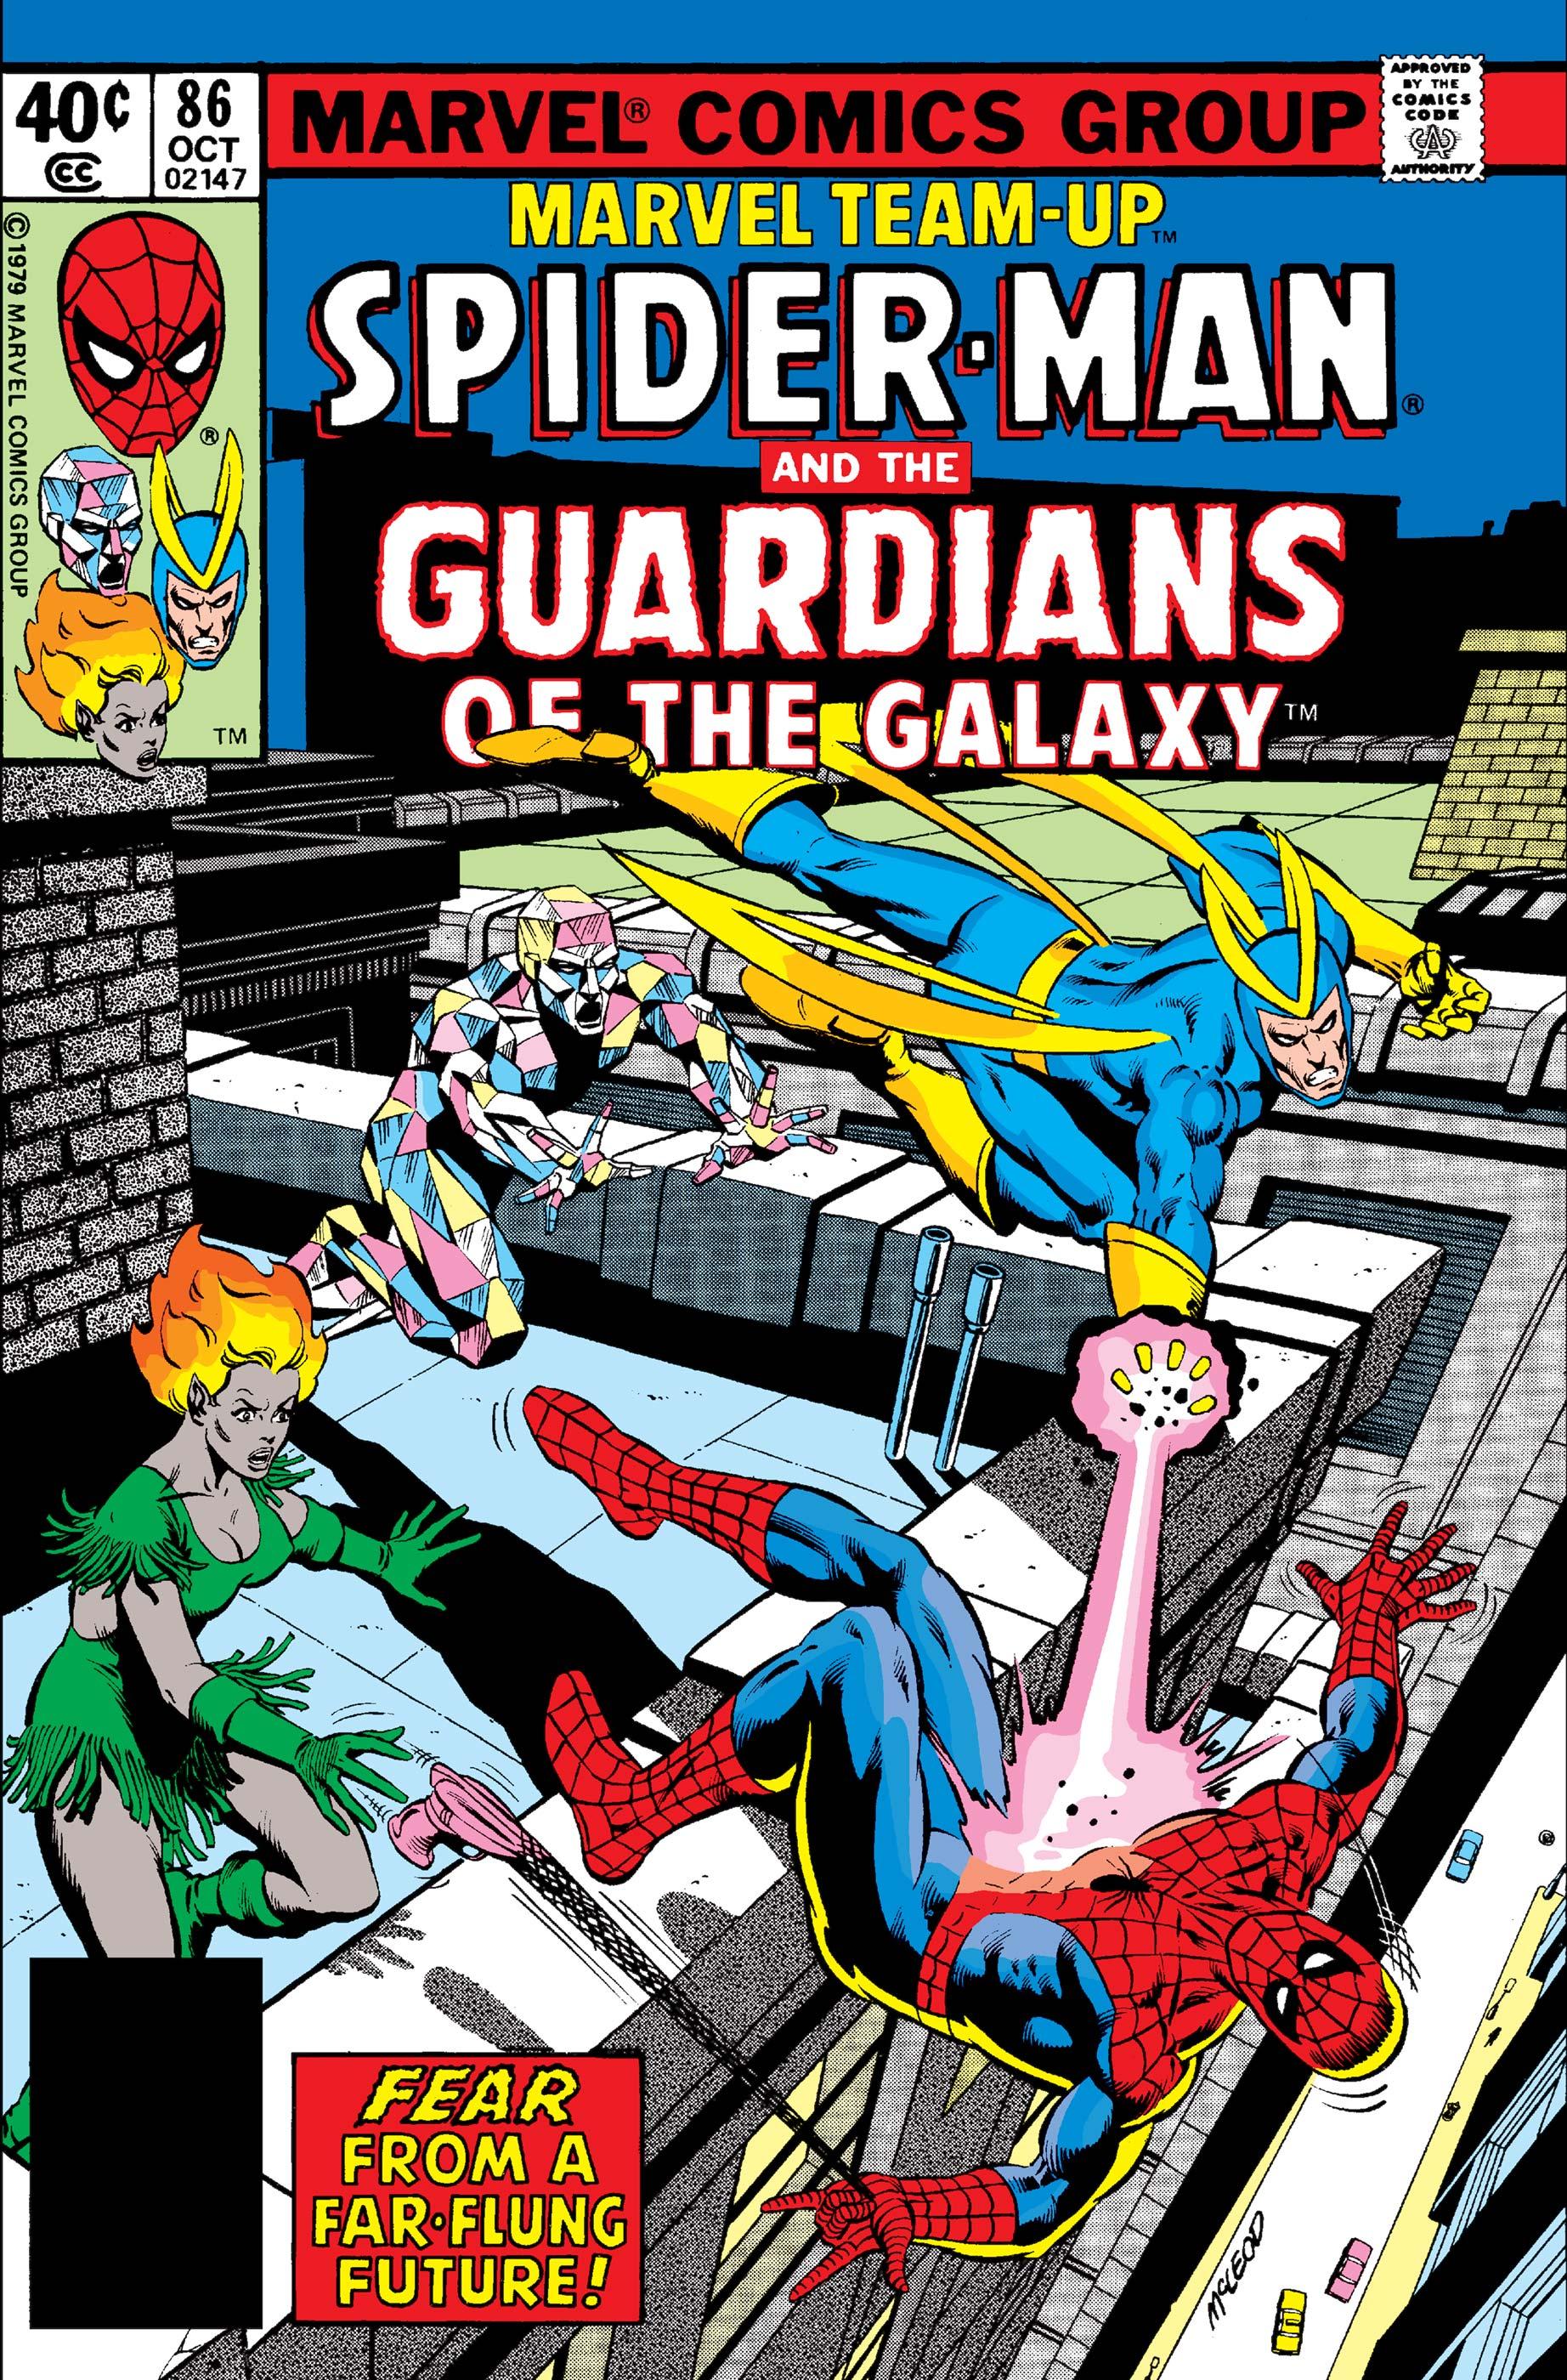 Marvel Team-Up (1972) #86